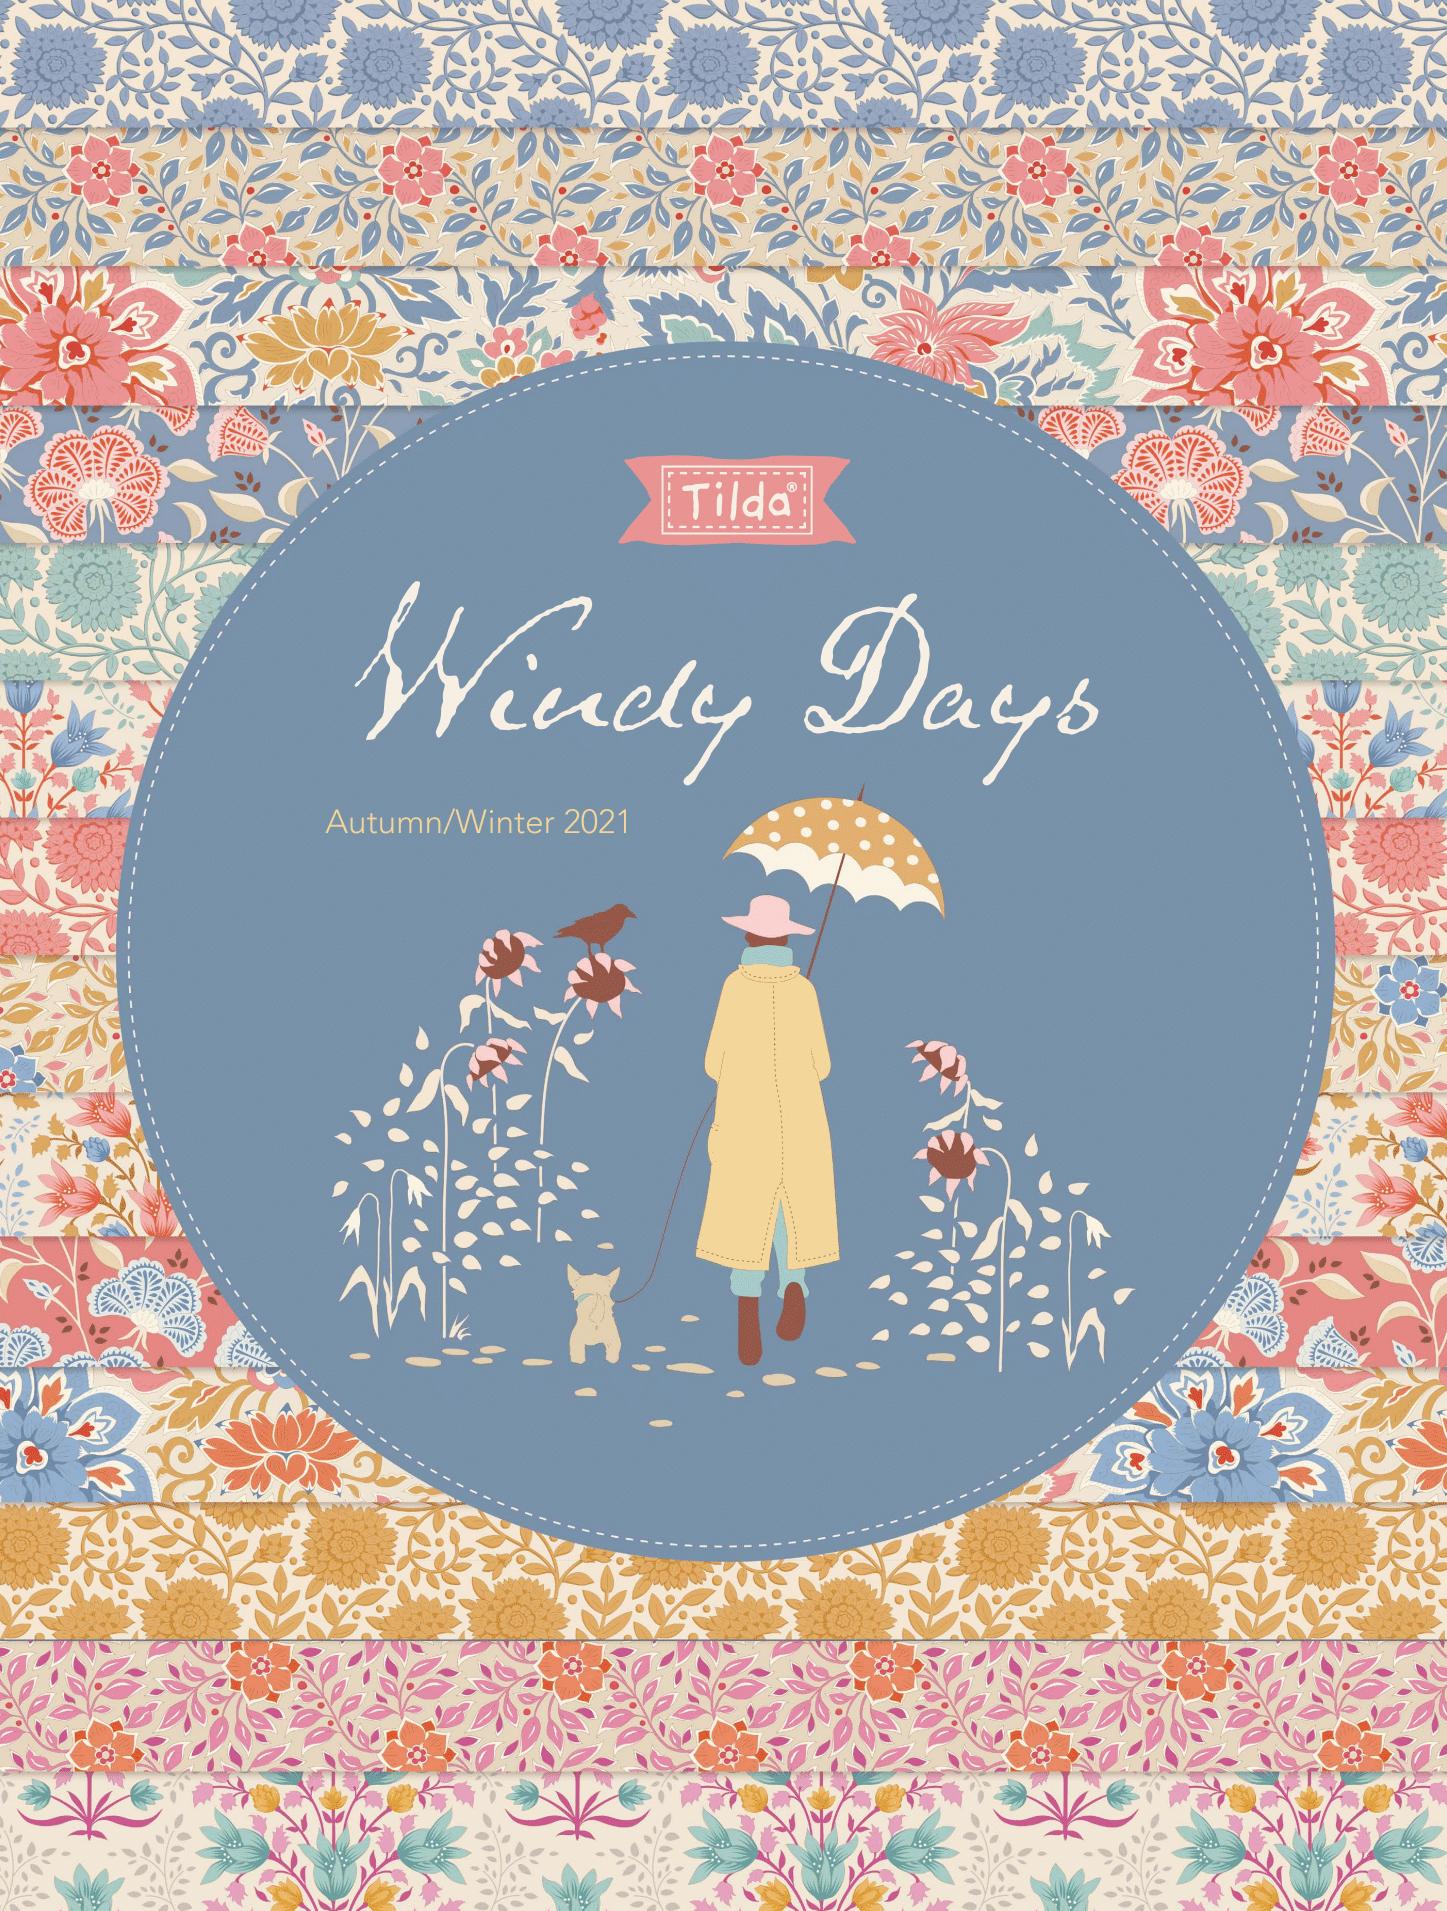 TILDA Windy Days